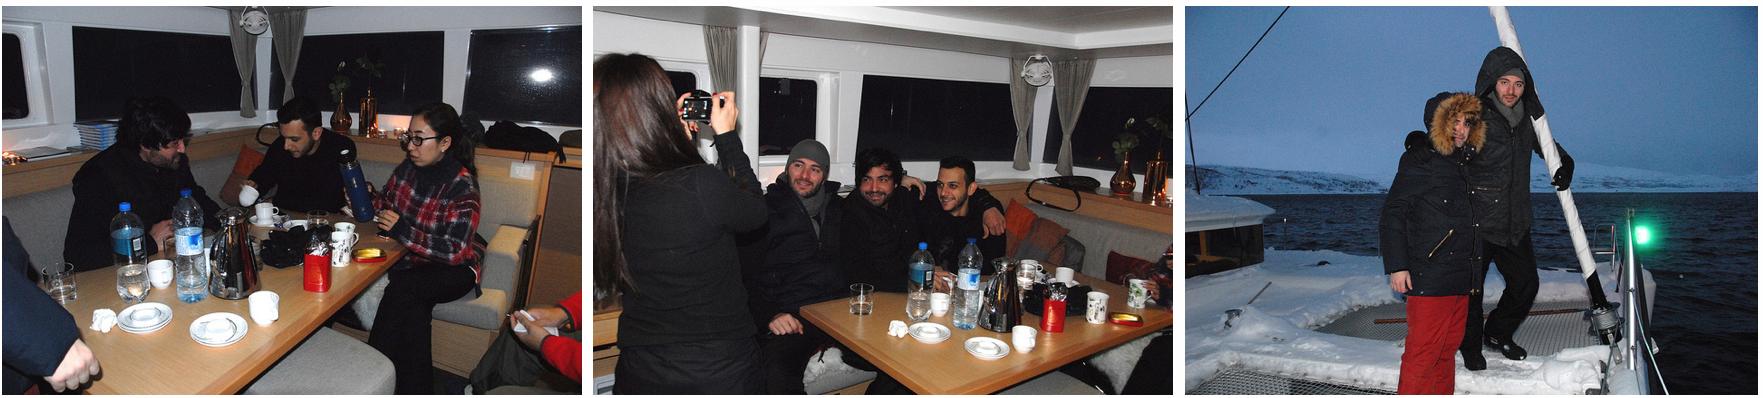 Whalesafari Tromsø - Fun Winter Experience